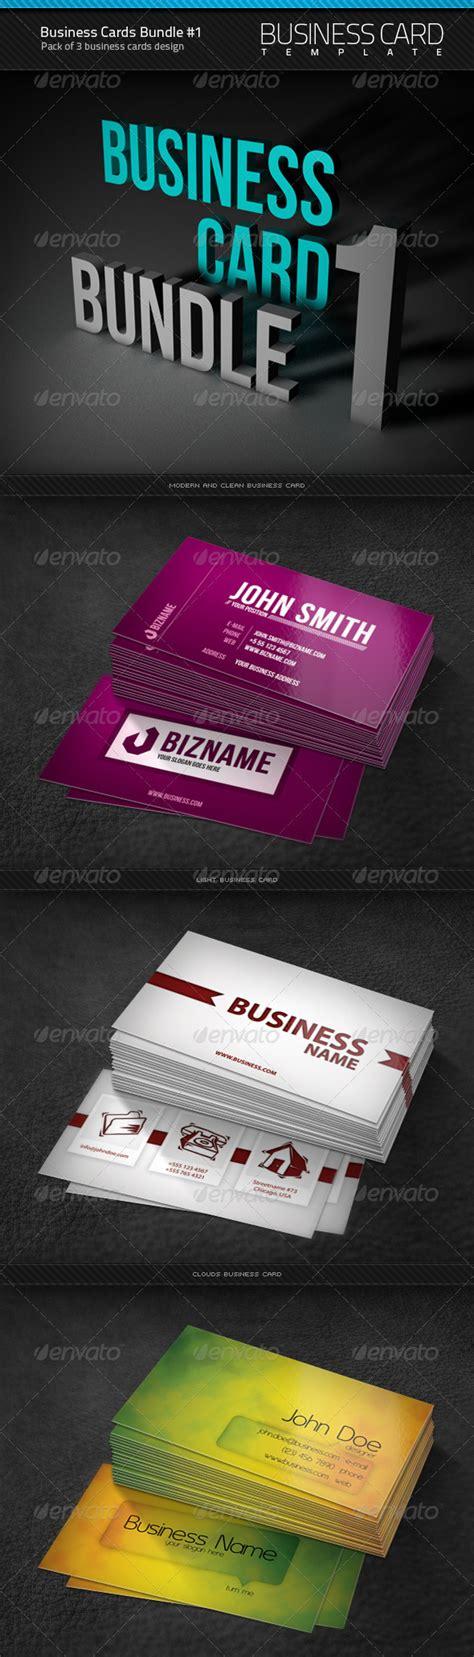 200 business card templates bundle 1 business cards bundle 1 graphicriver